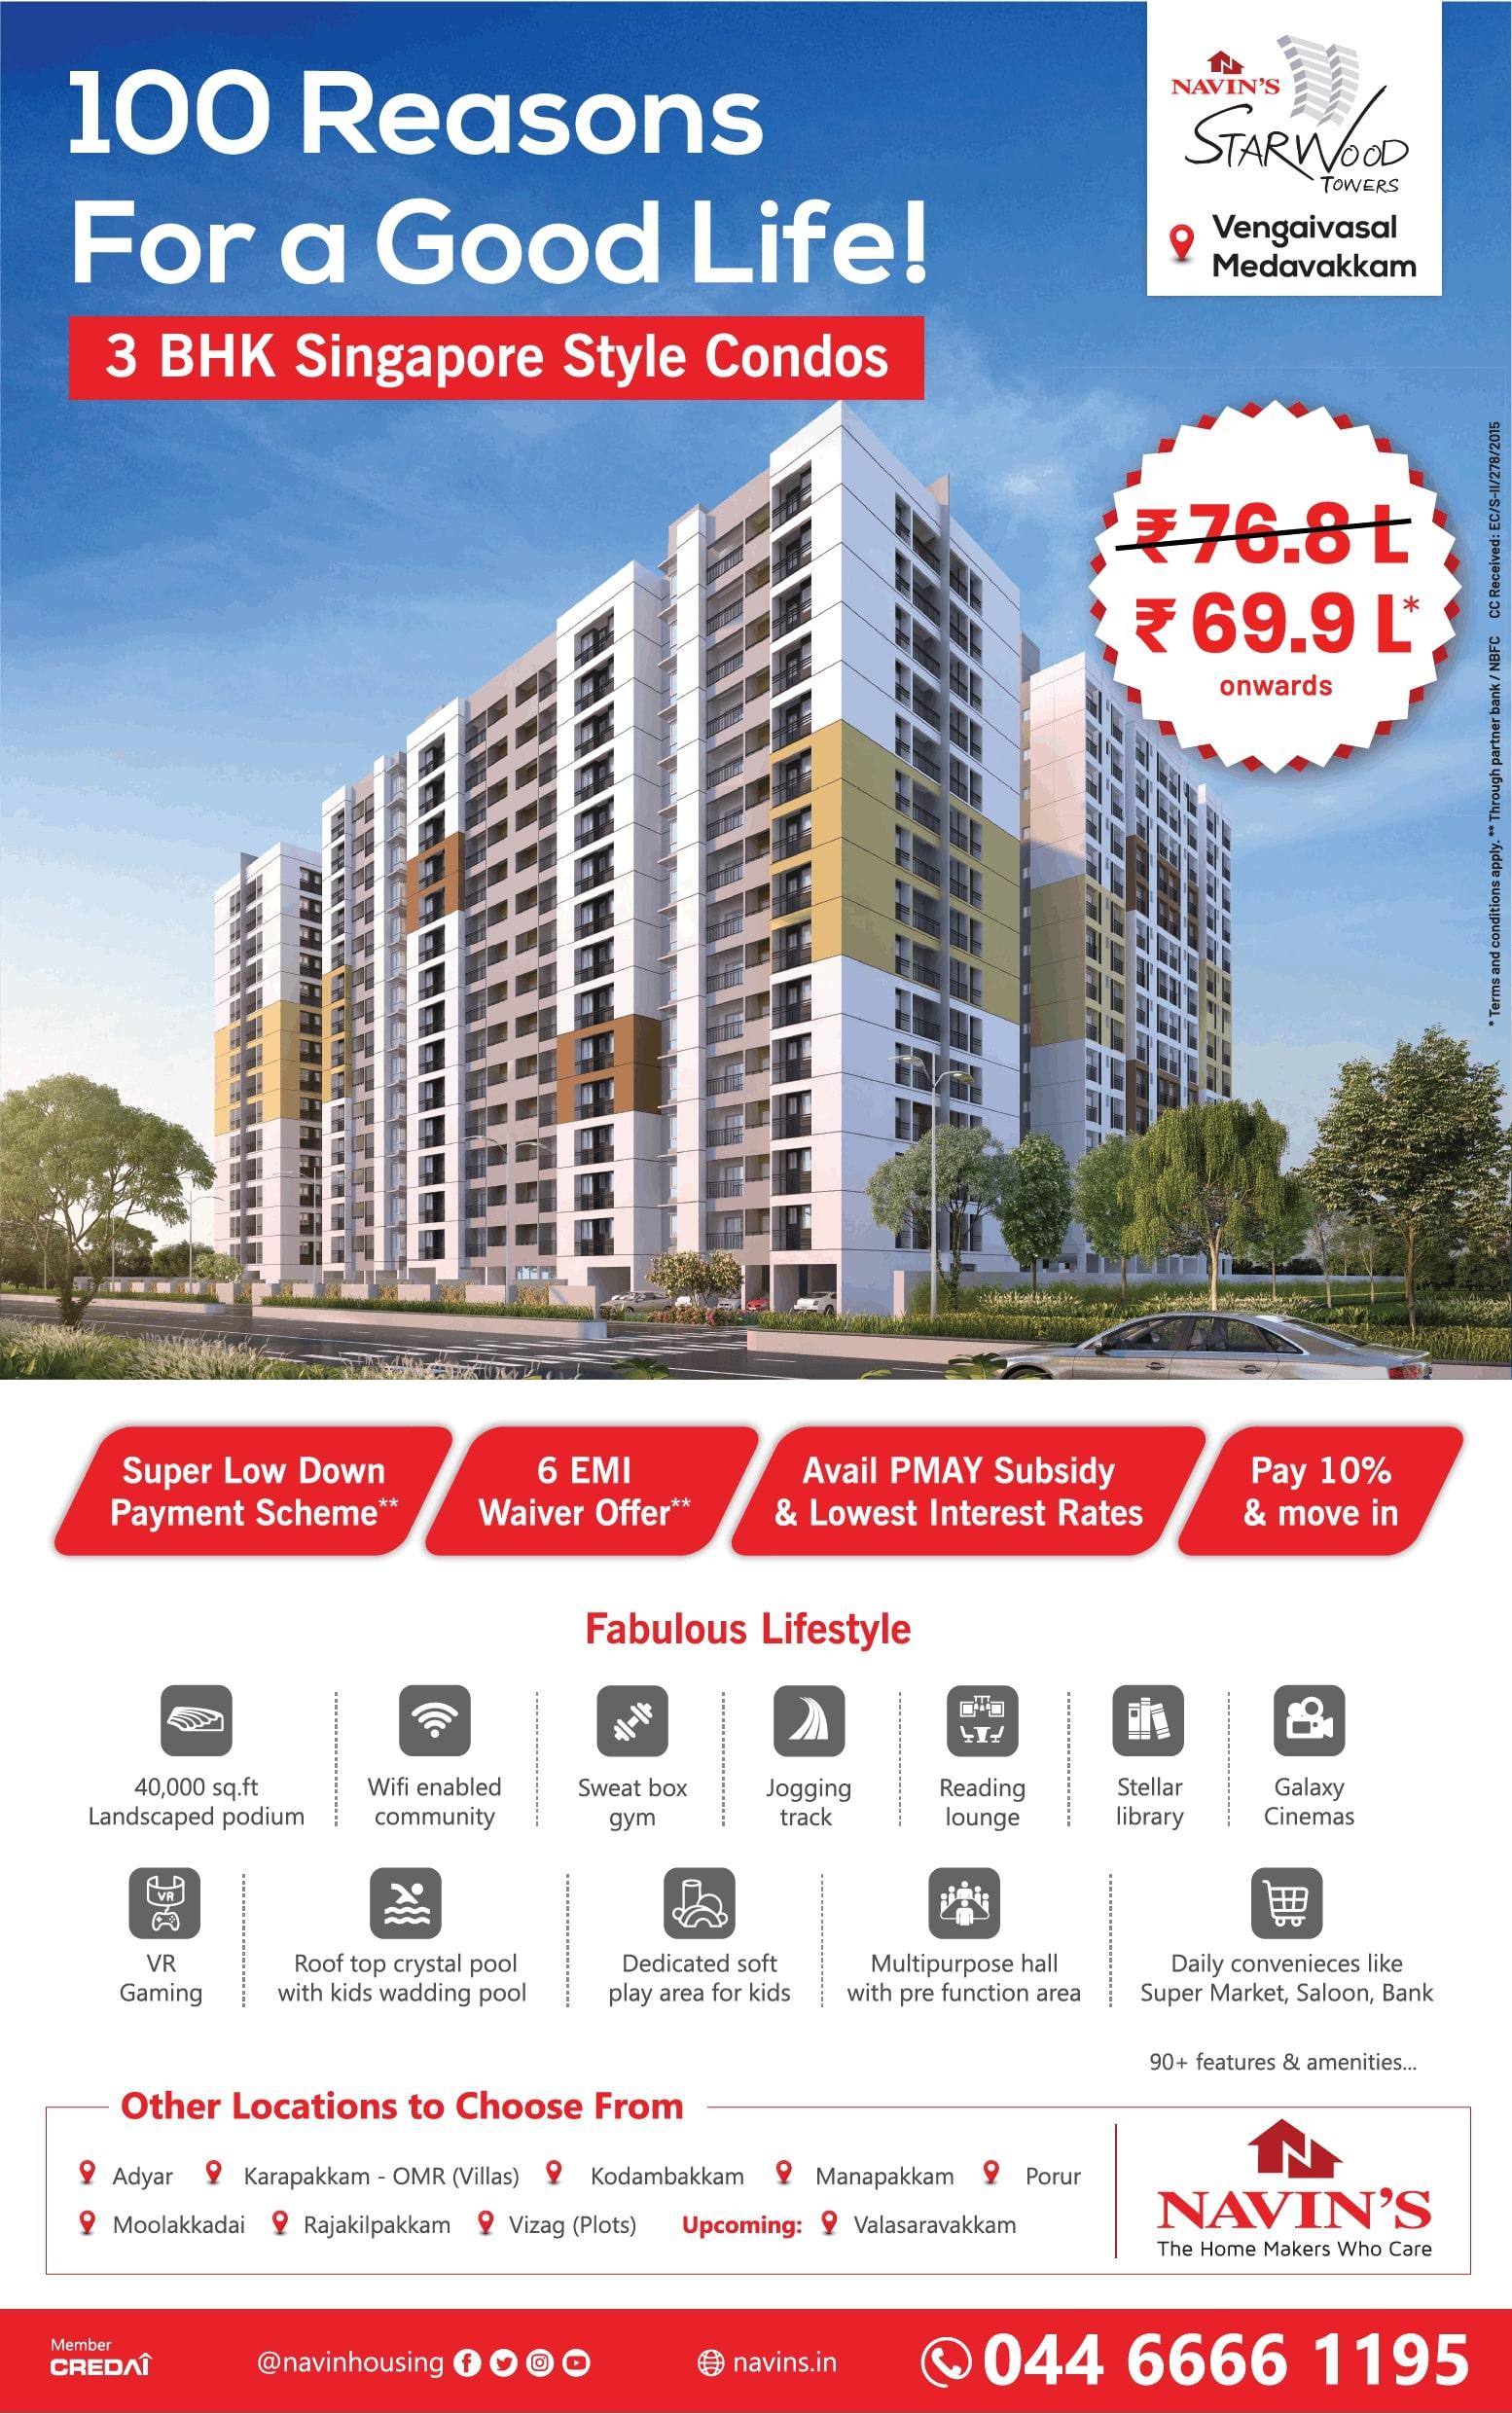 navins-siakwood-3-bhk-singapore-style-condos-ad-property-times-chennai-30-01-2021